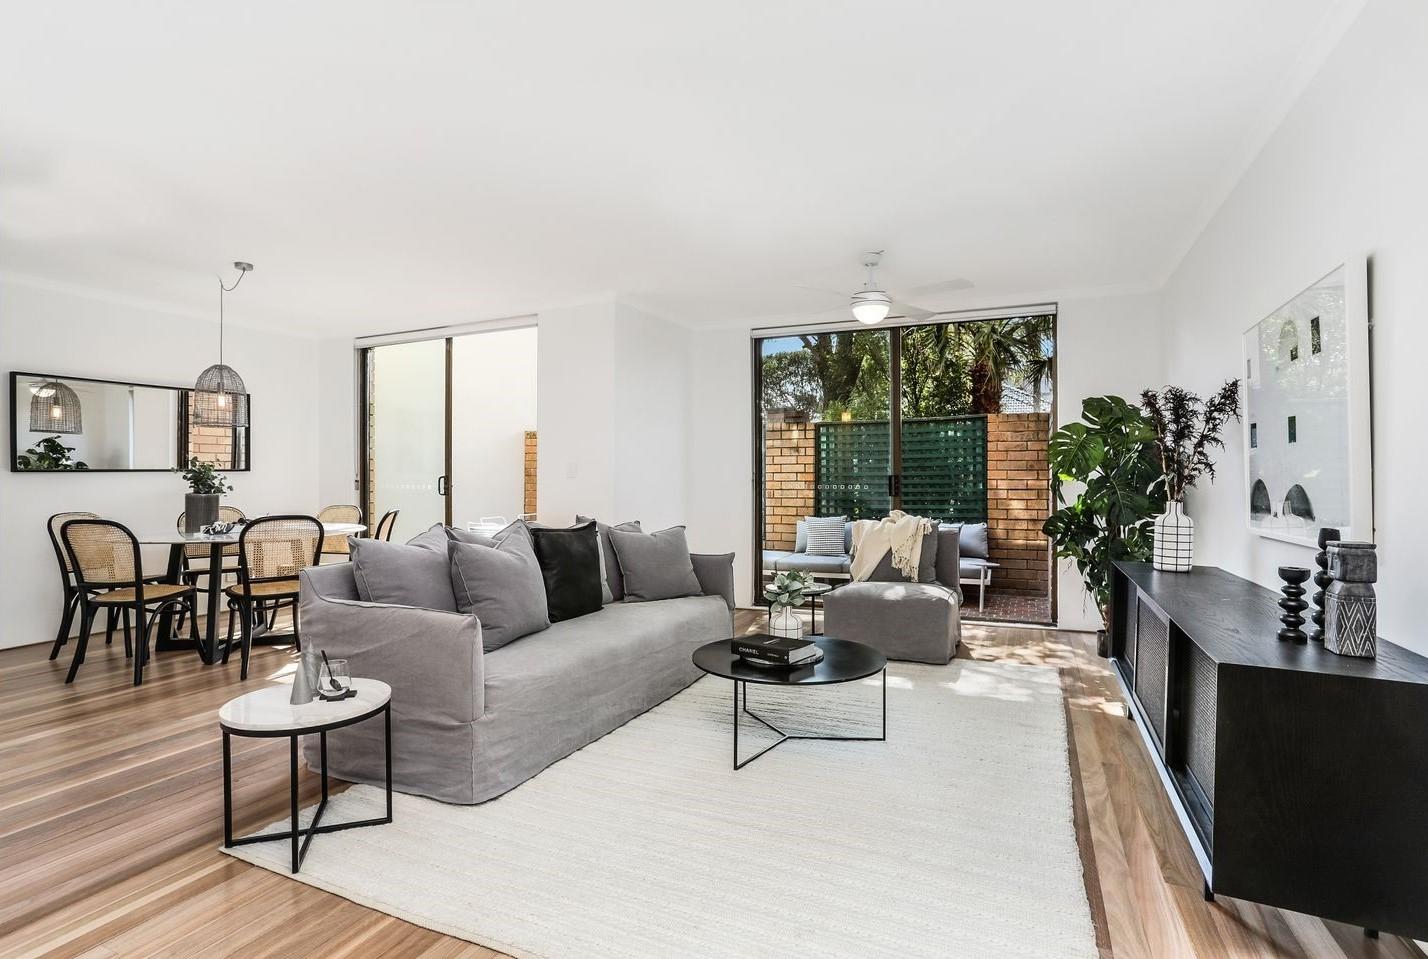 https://www.propertybuyer.com.au/hubfs/crevan murphy (2)